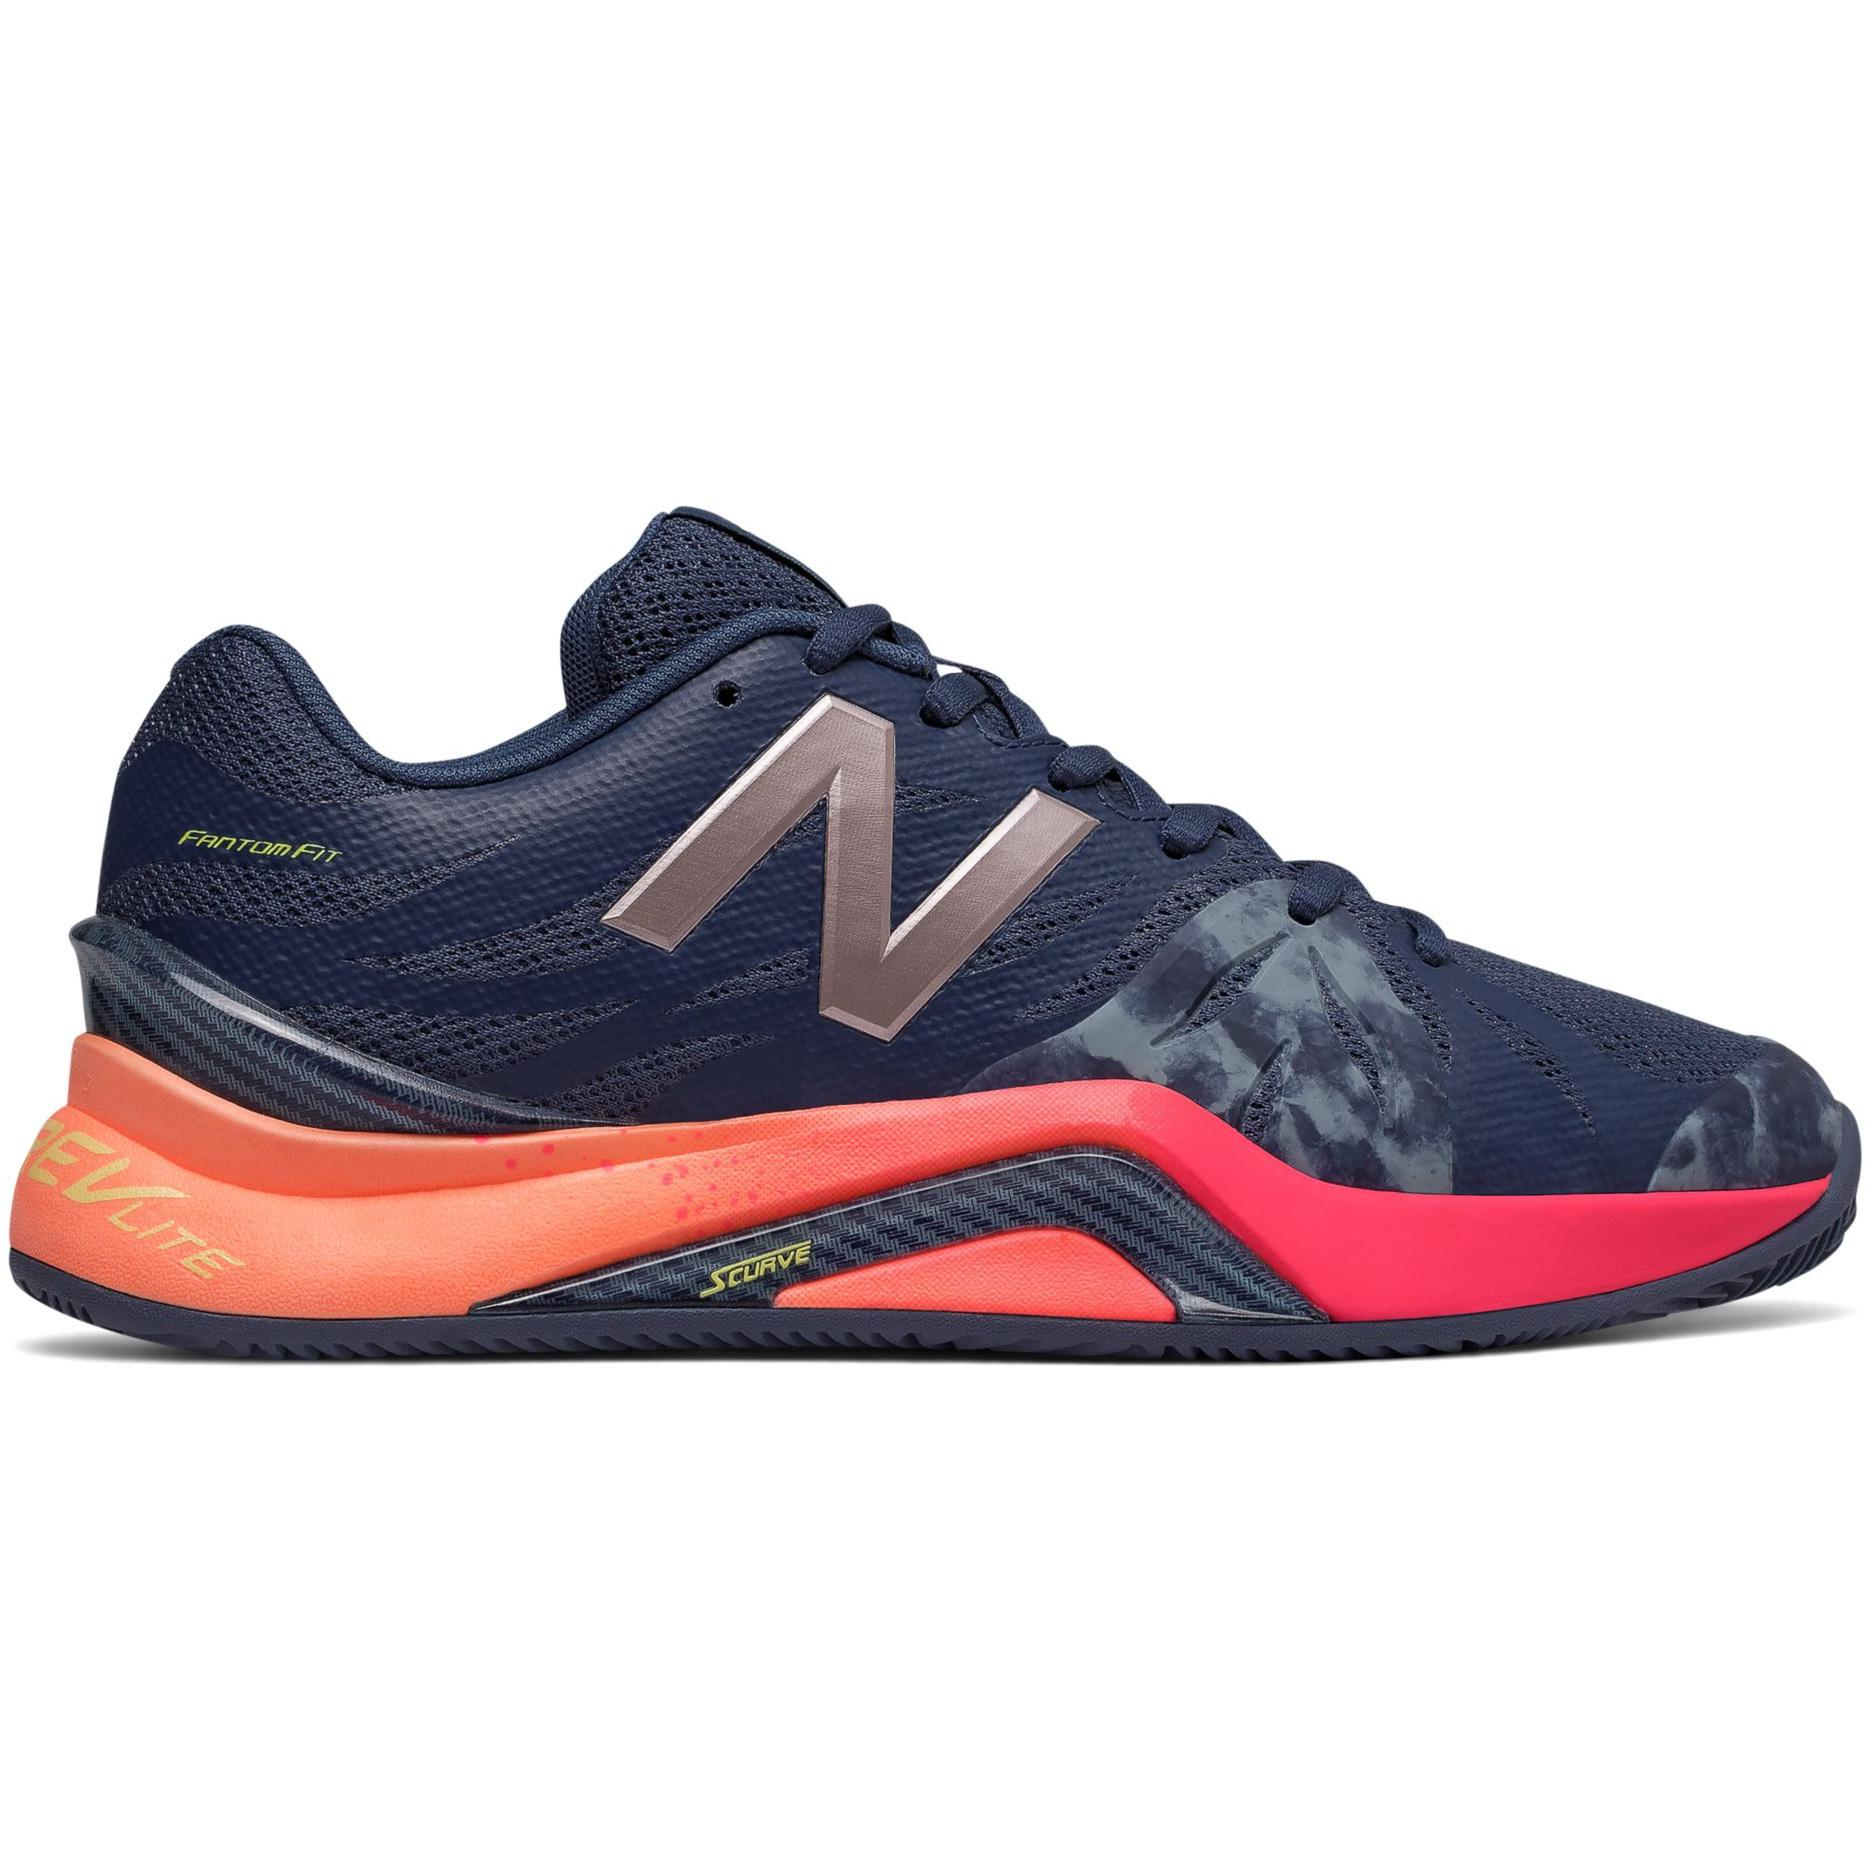 timeless design 112d0 d1ef5 New Balance Womens 1296v2 Tennis Shoes - Indigo Pink (B) - Tennisnuts.com